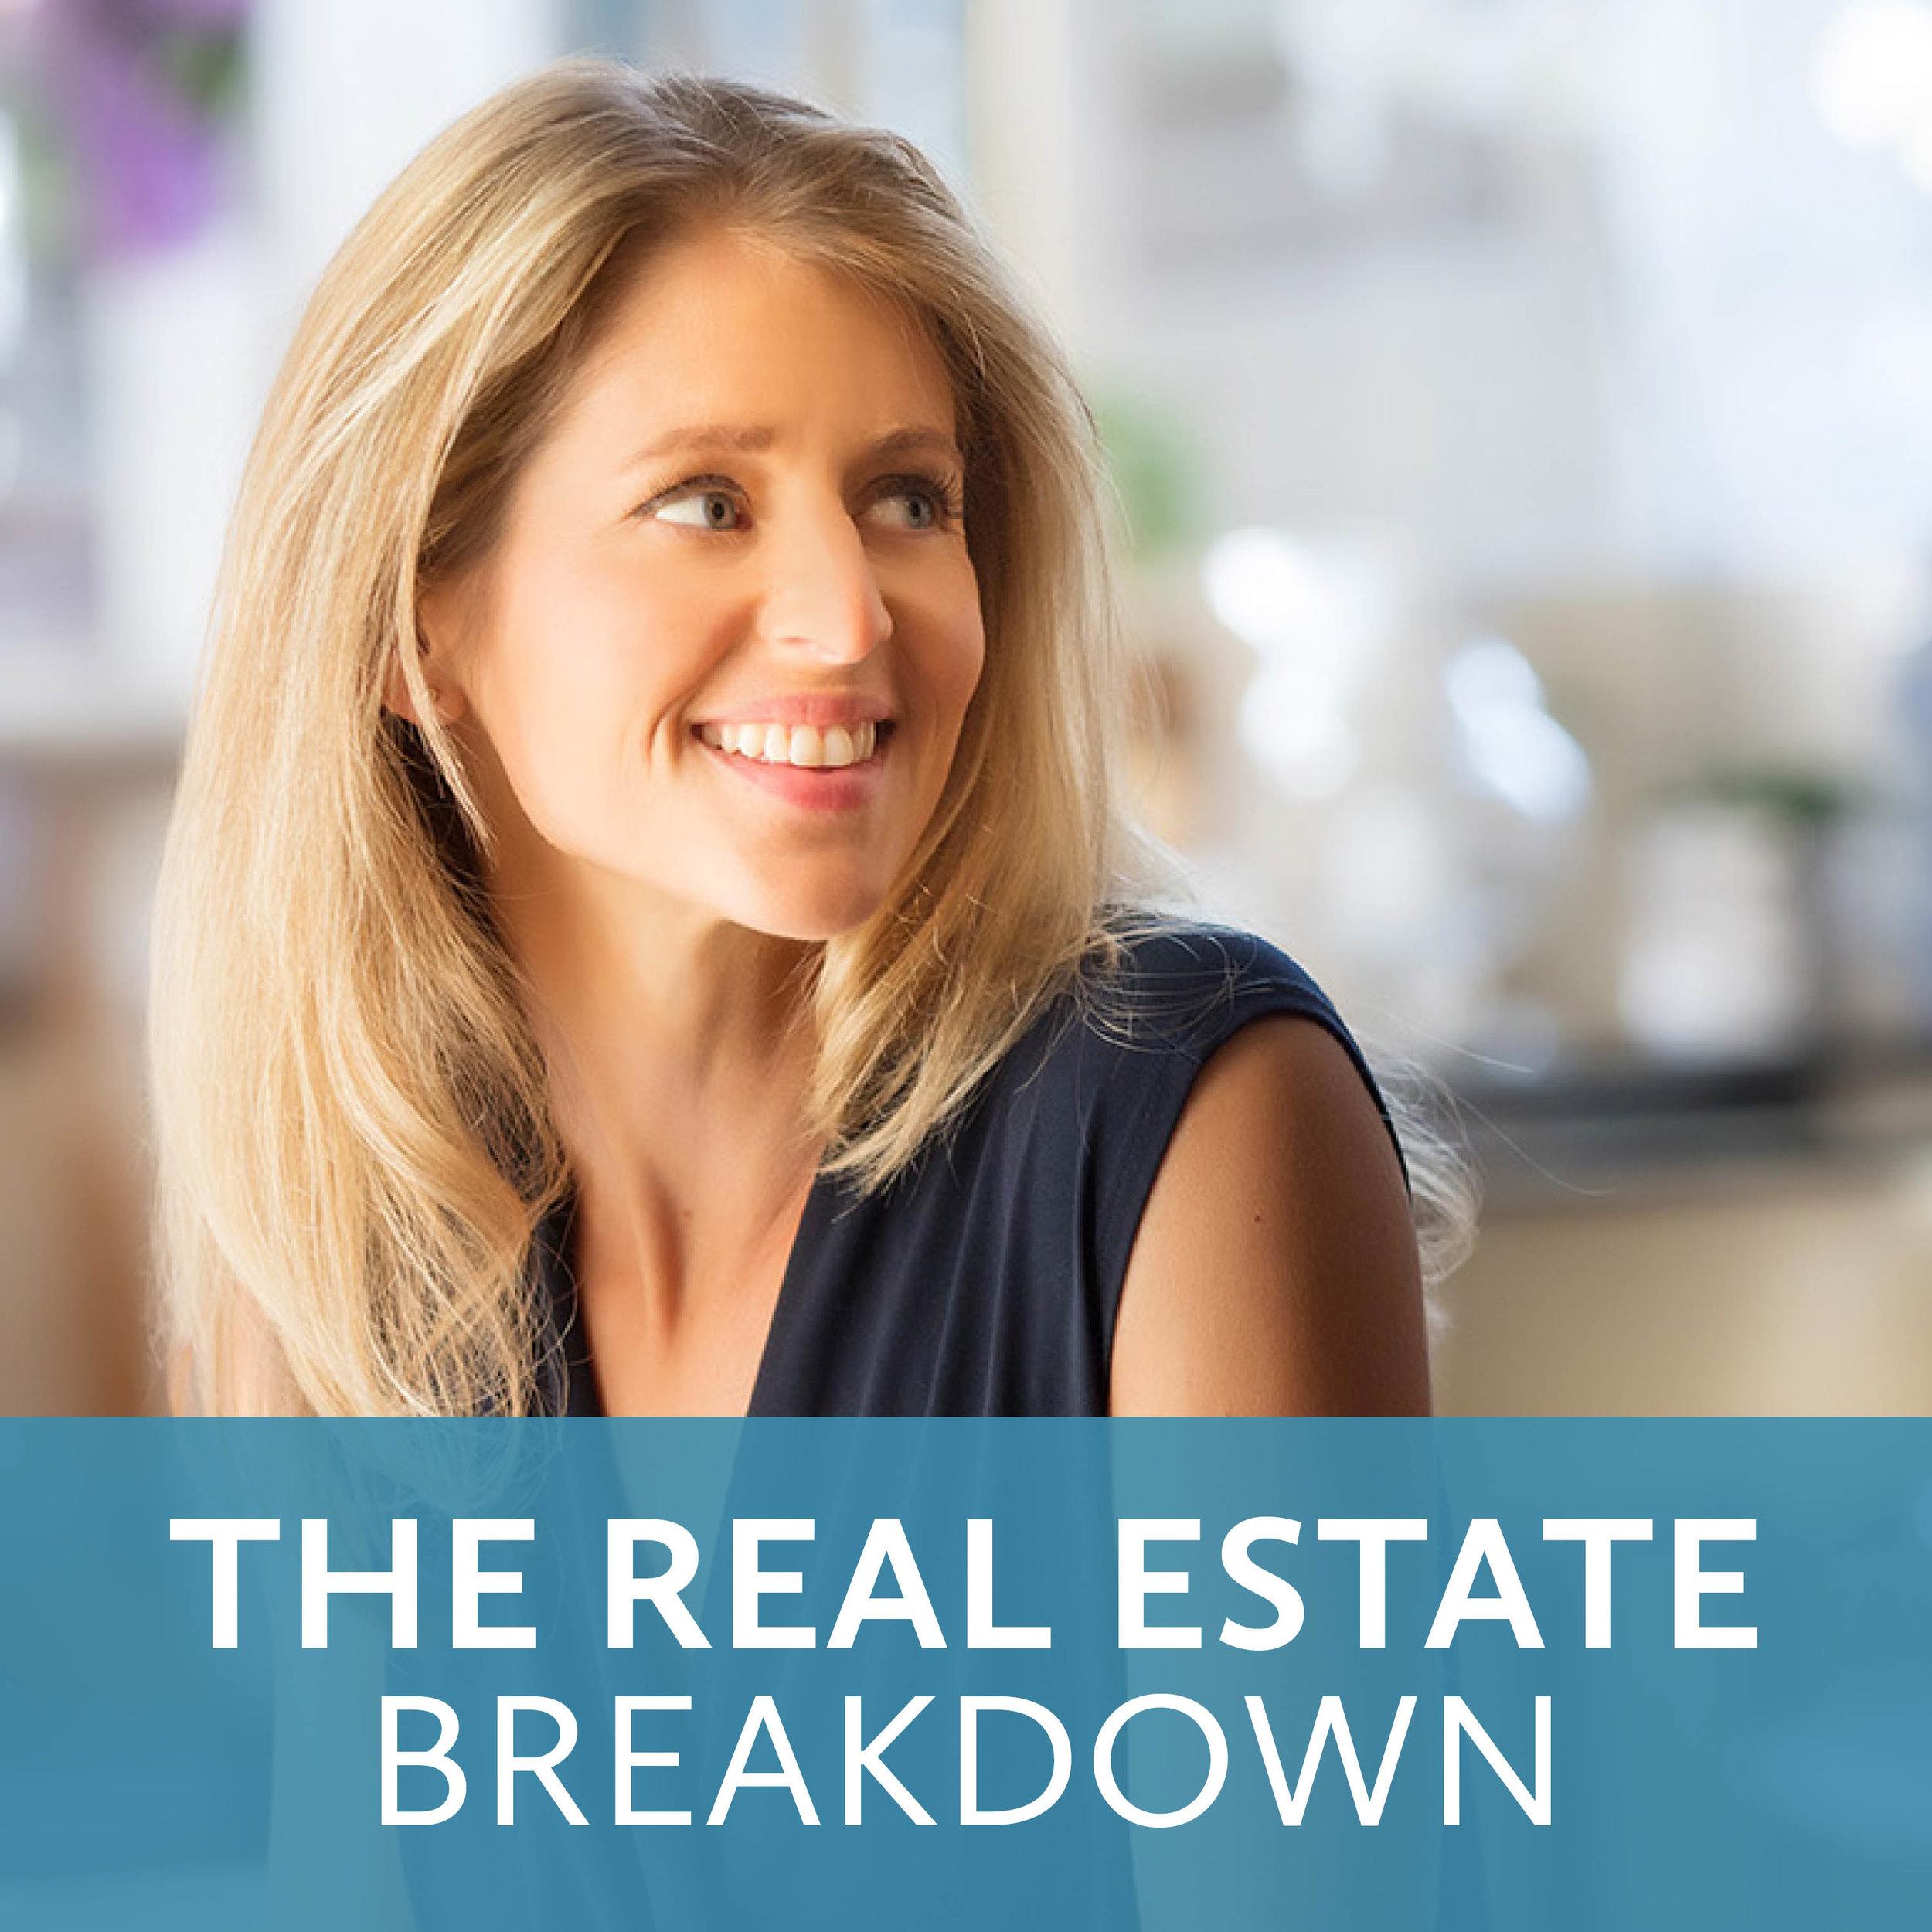 The Real Estate Breakdown